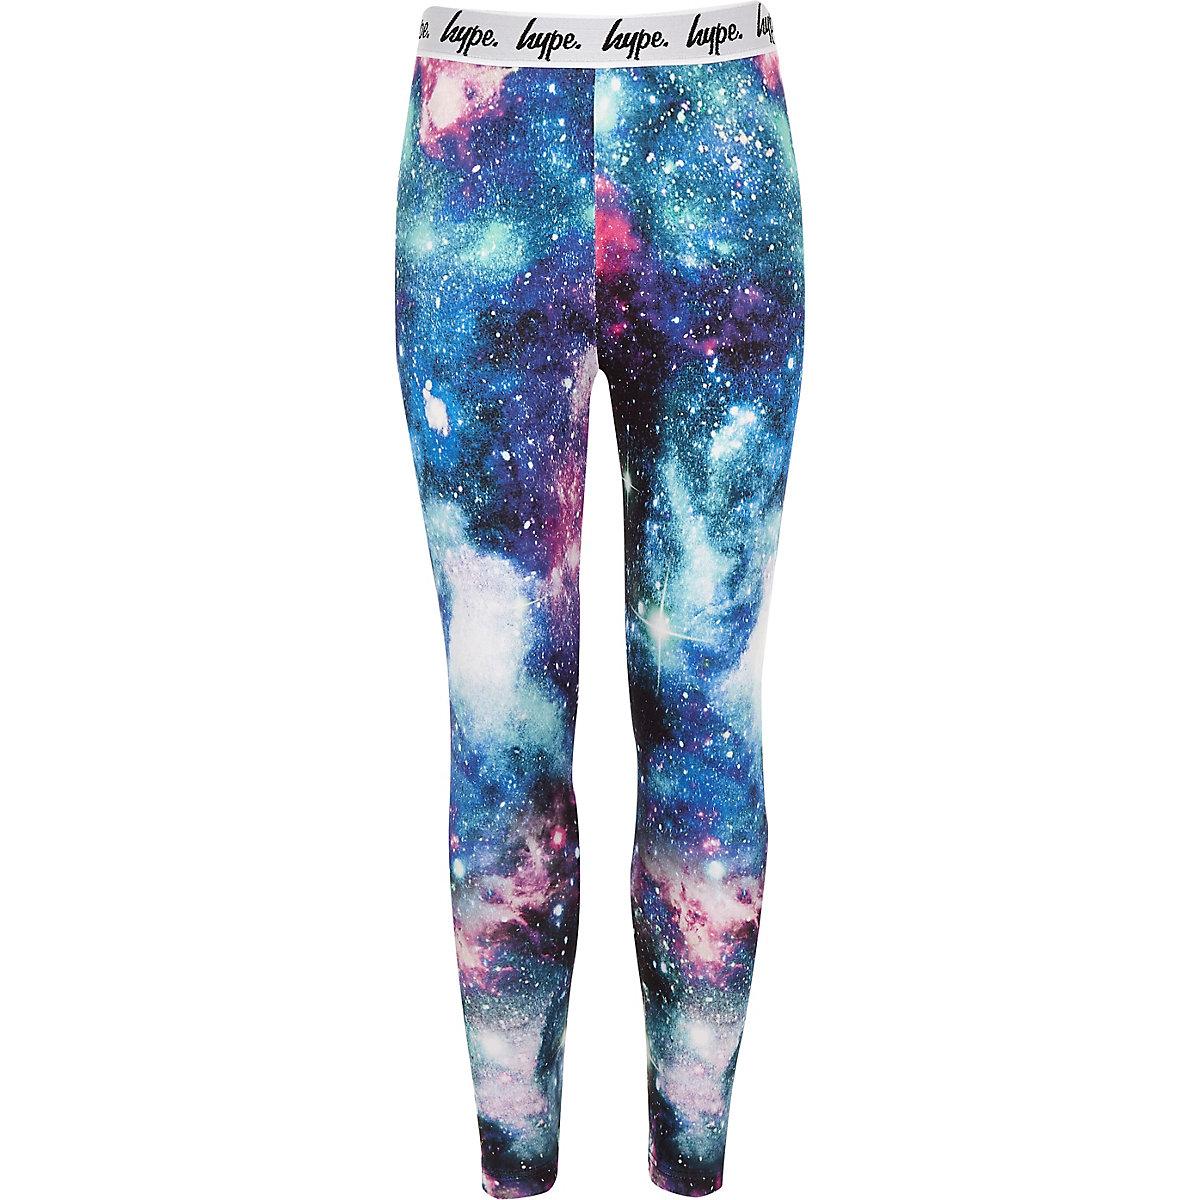 Girls Hype black galaxy print leggings - Leggings - girls